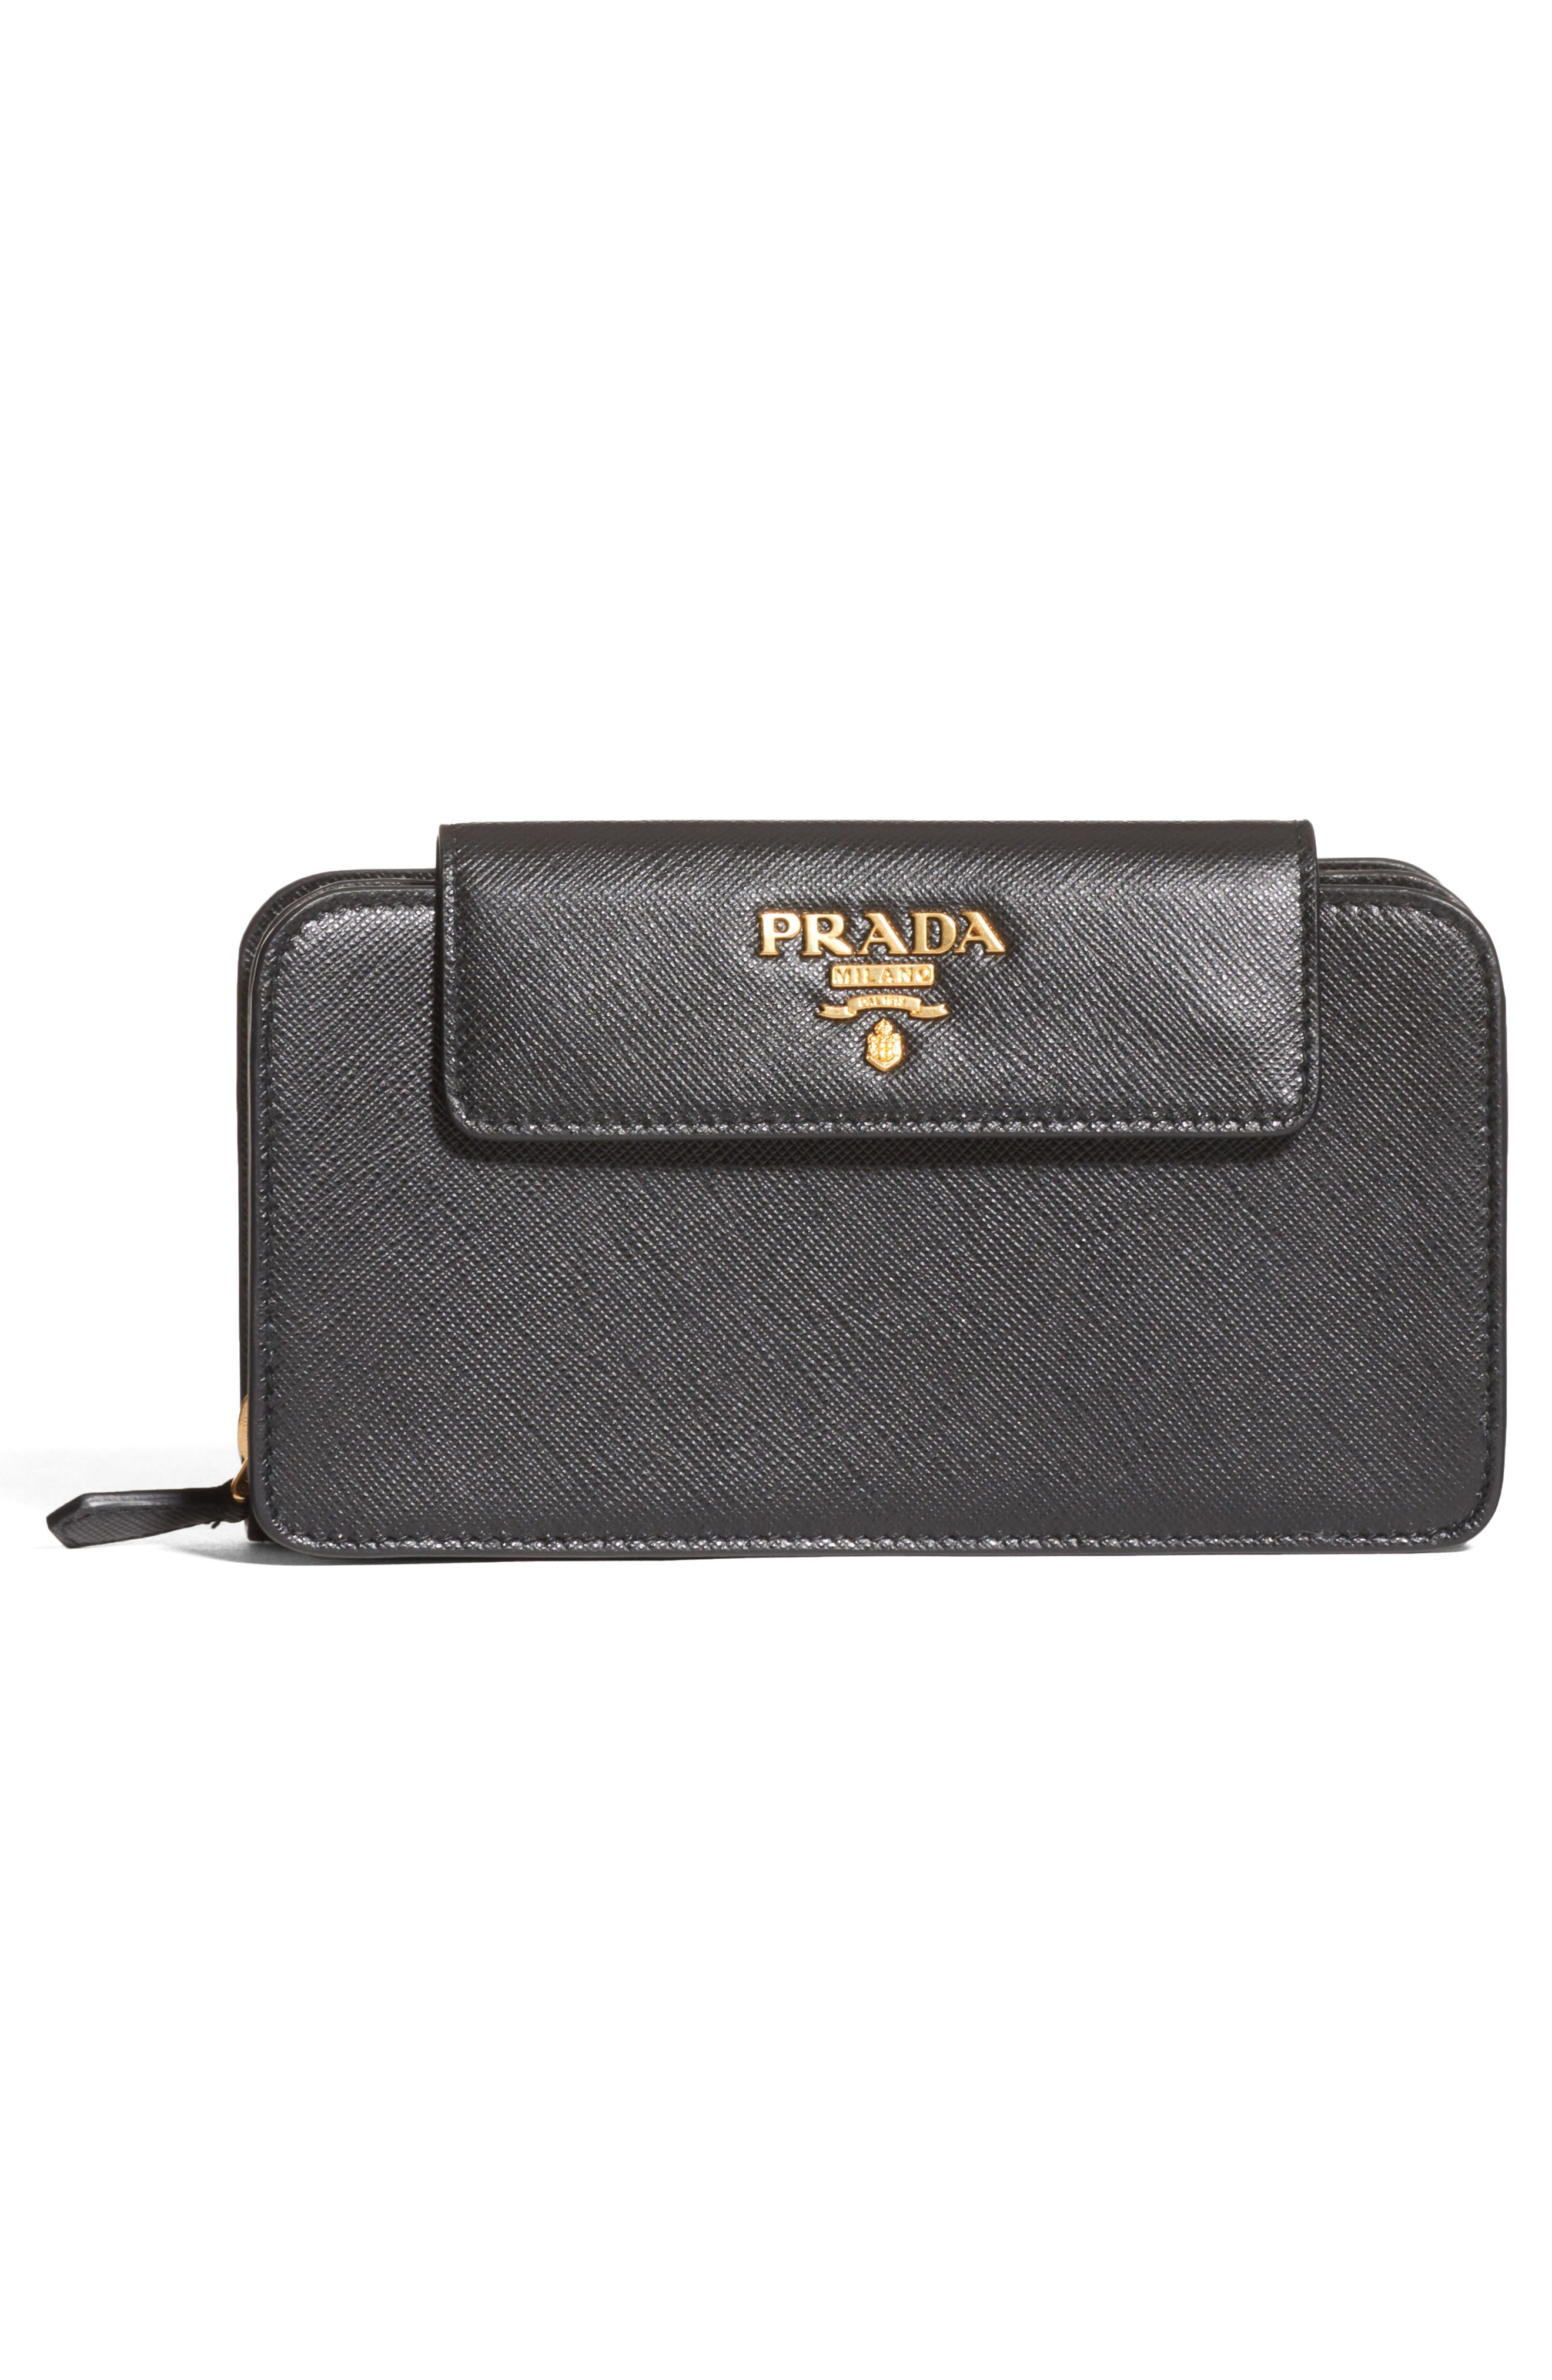 PRADA, Saffiano Leather Wallet on a Chain, Alternate thumbnail 3, color, NERO